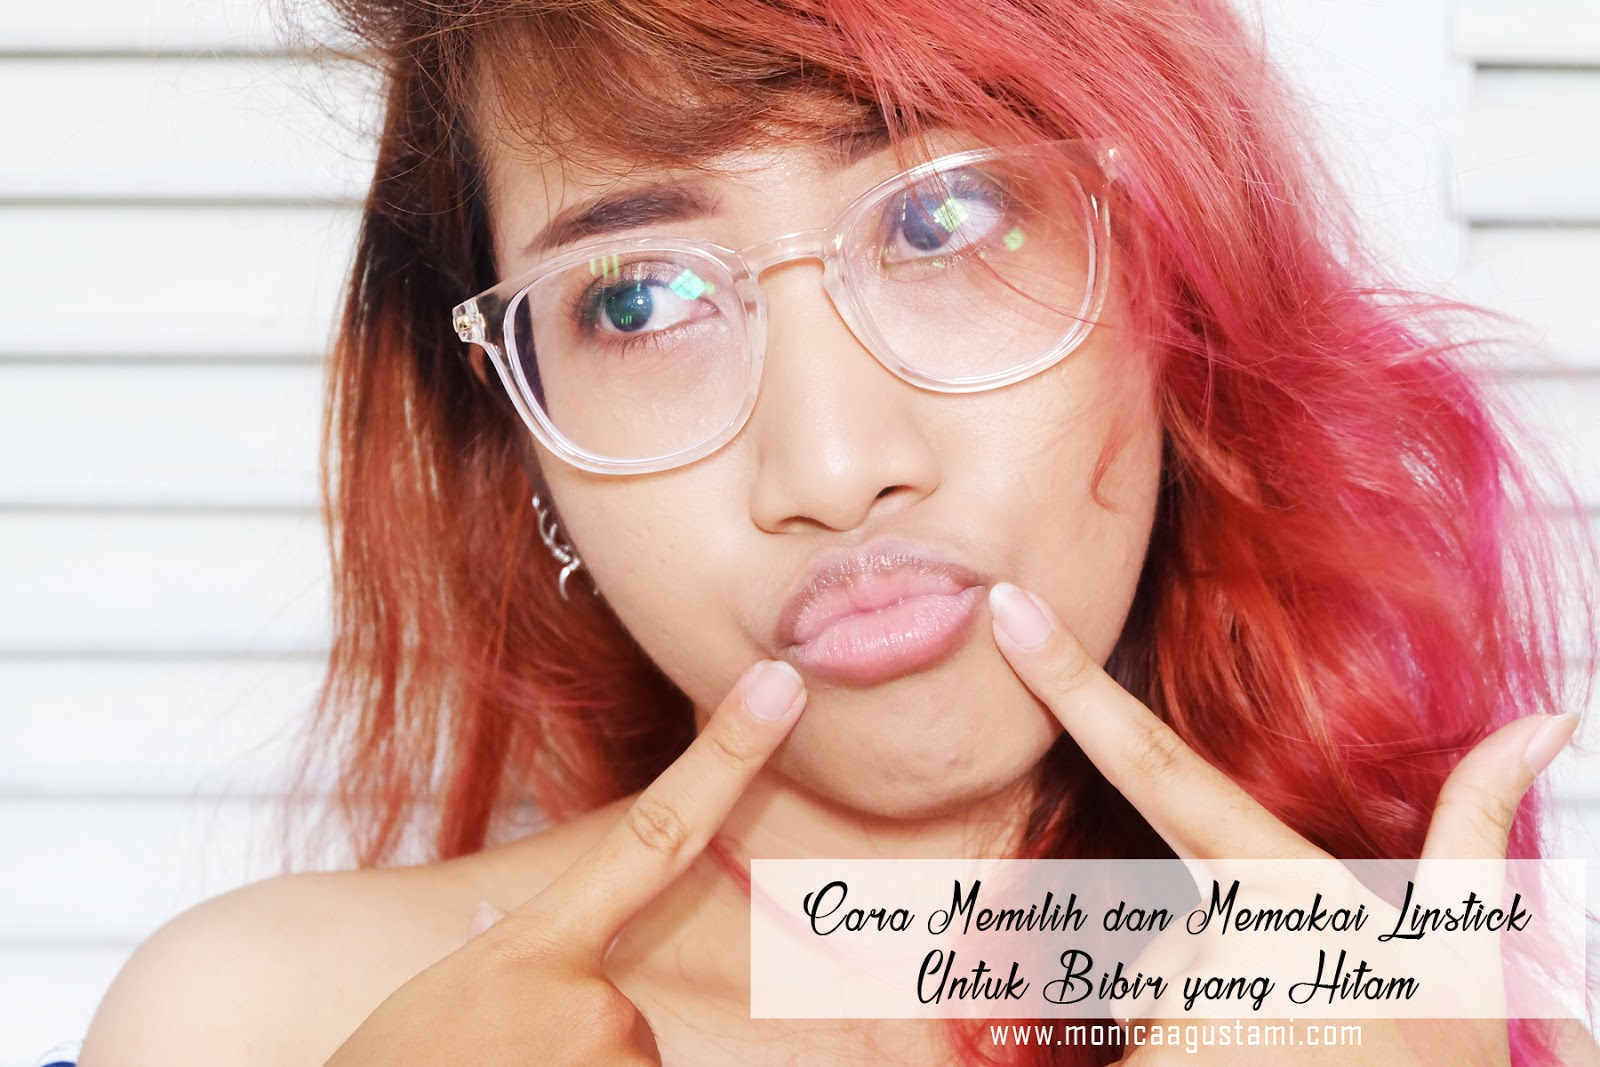 Monica Agustami Tips Bagaimana Cara Memilih dan Memakai